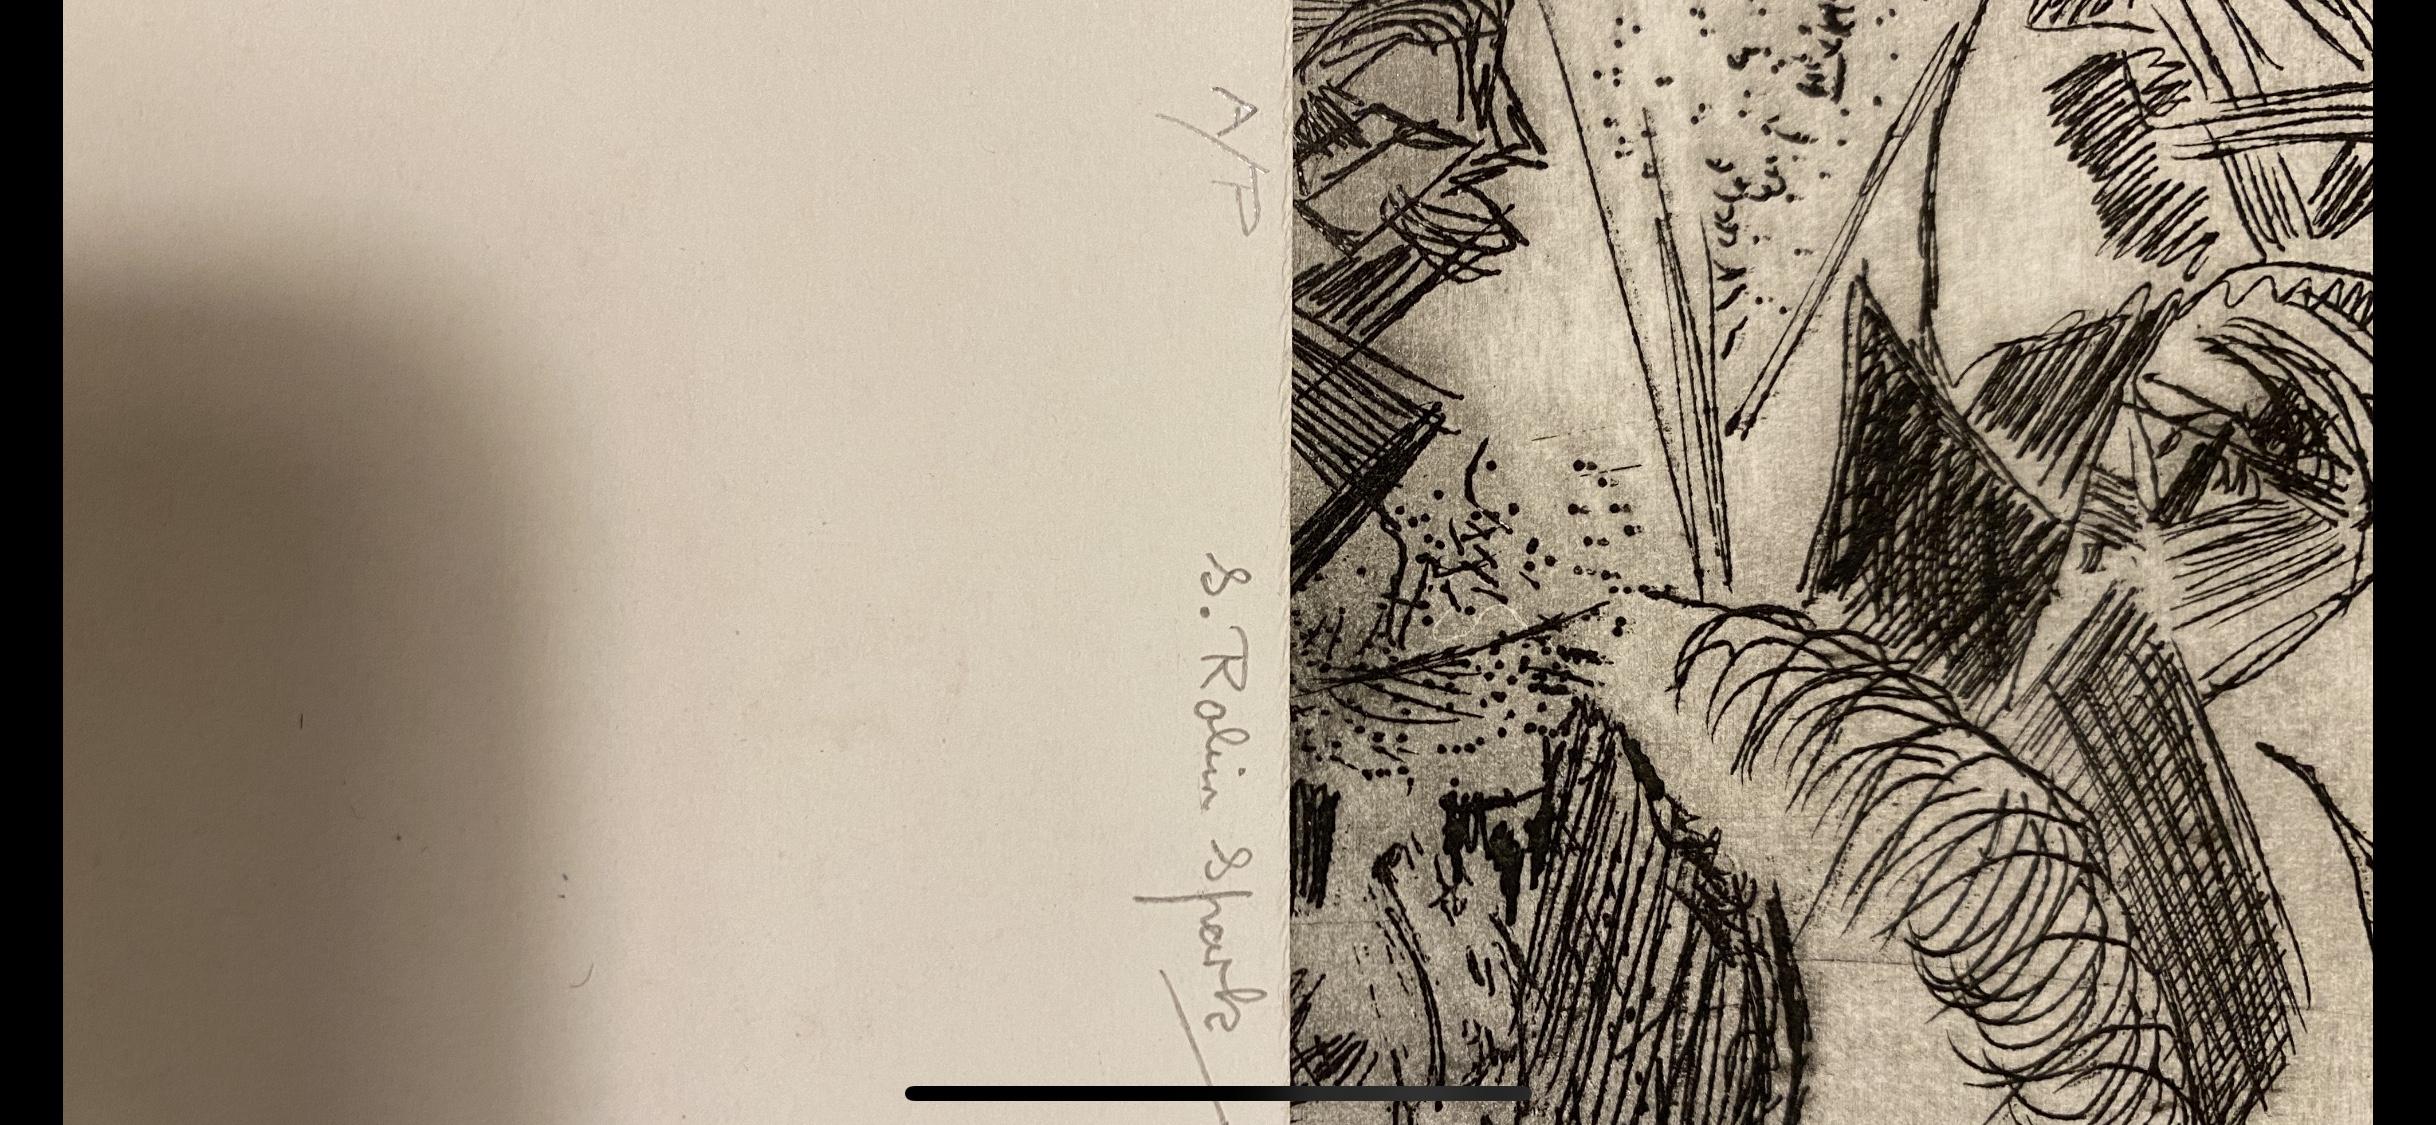 Samuel Robin Spark, Artist Proof `Print 92 - Image 2 of 4